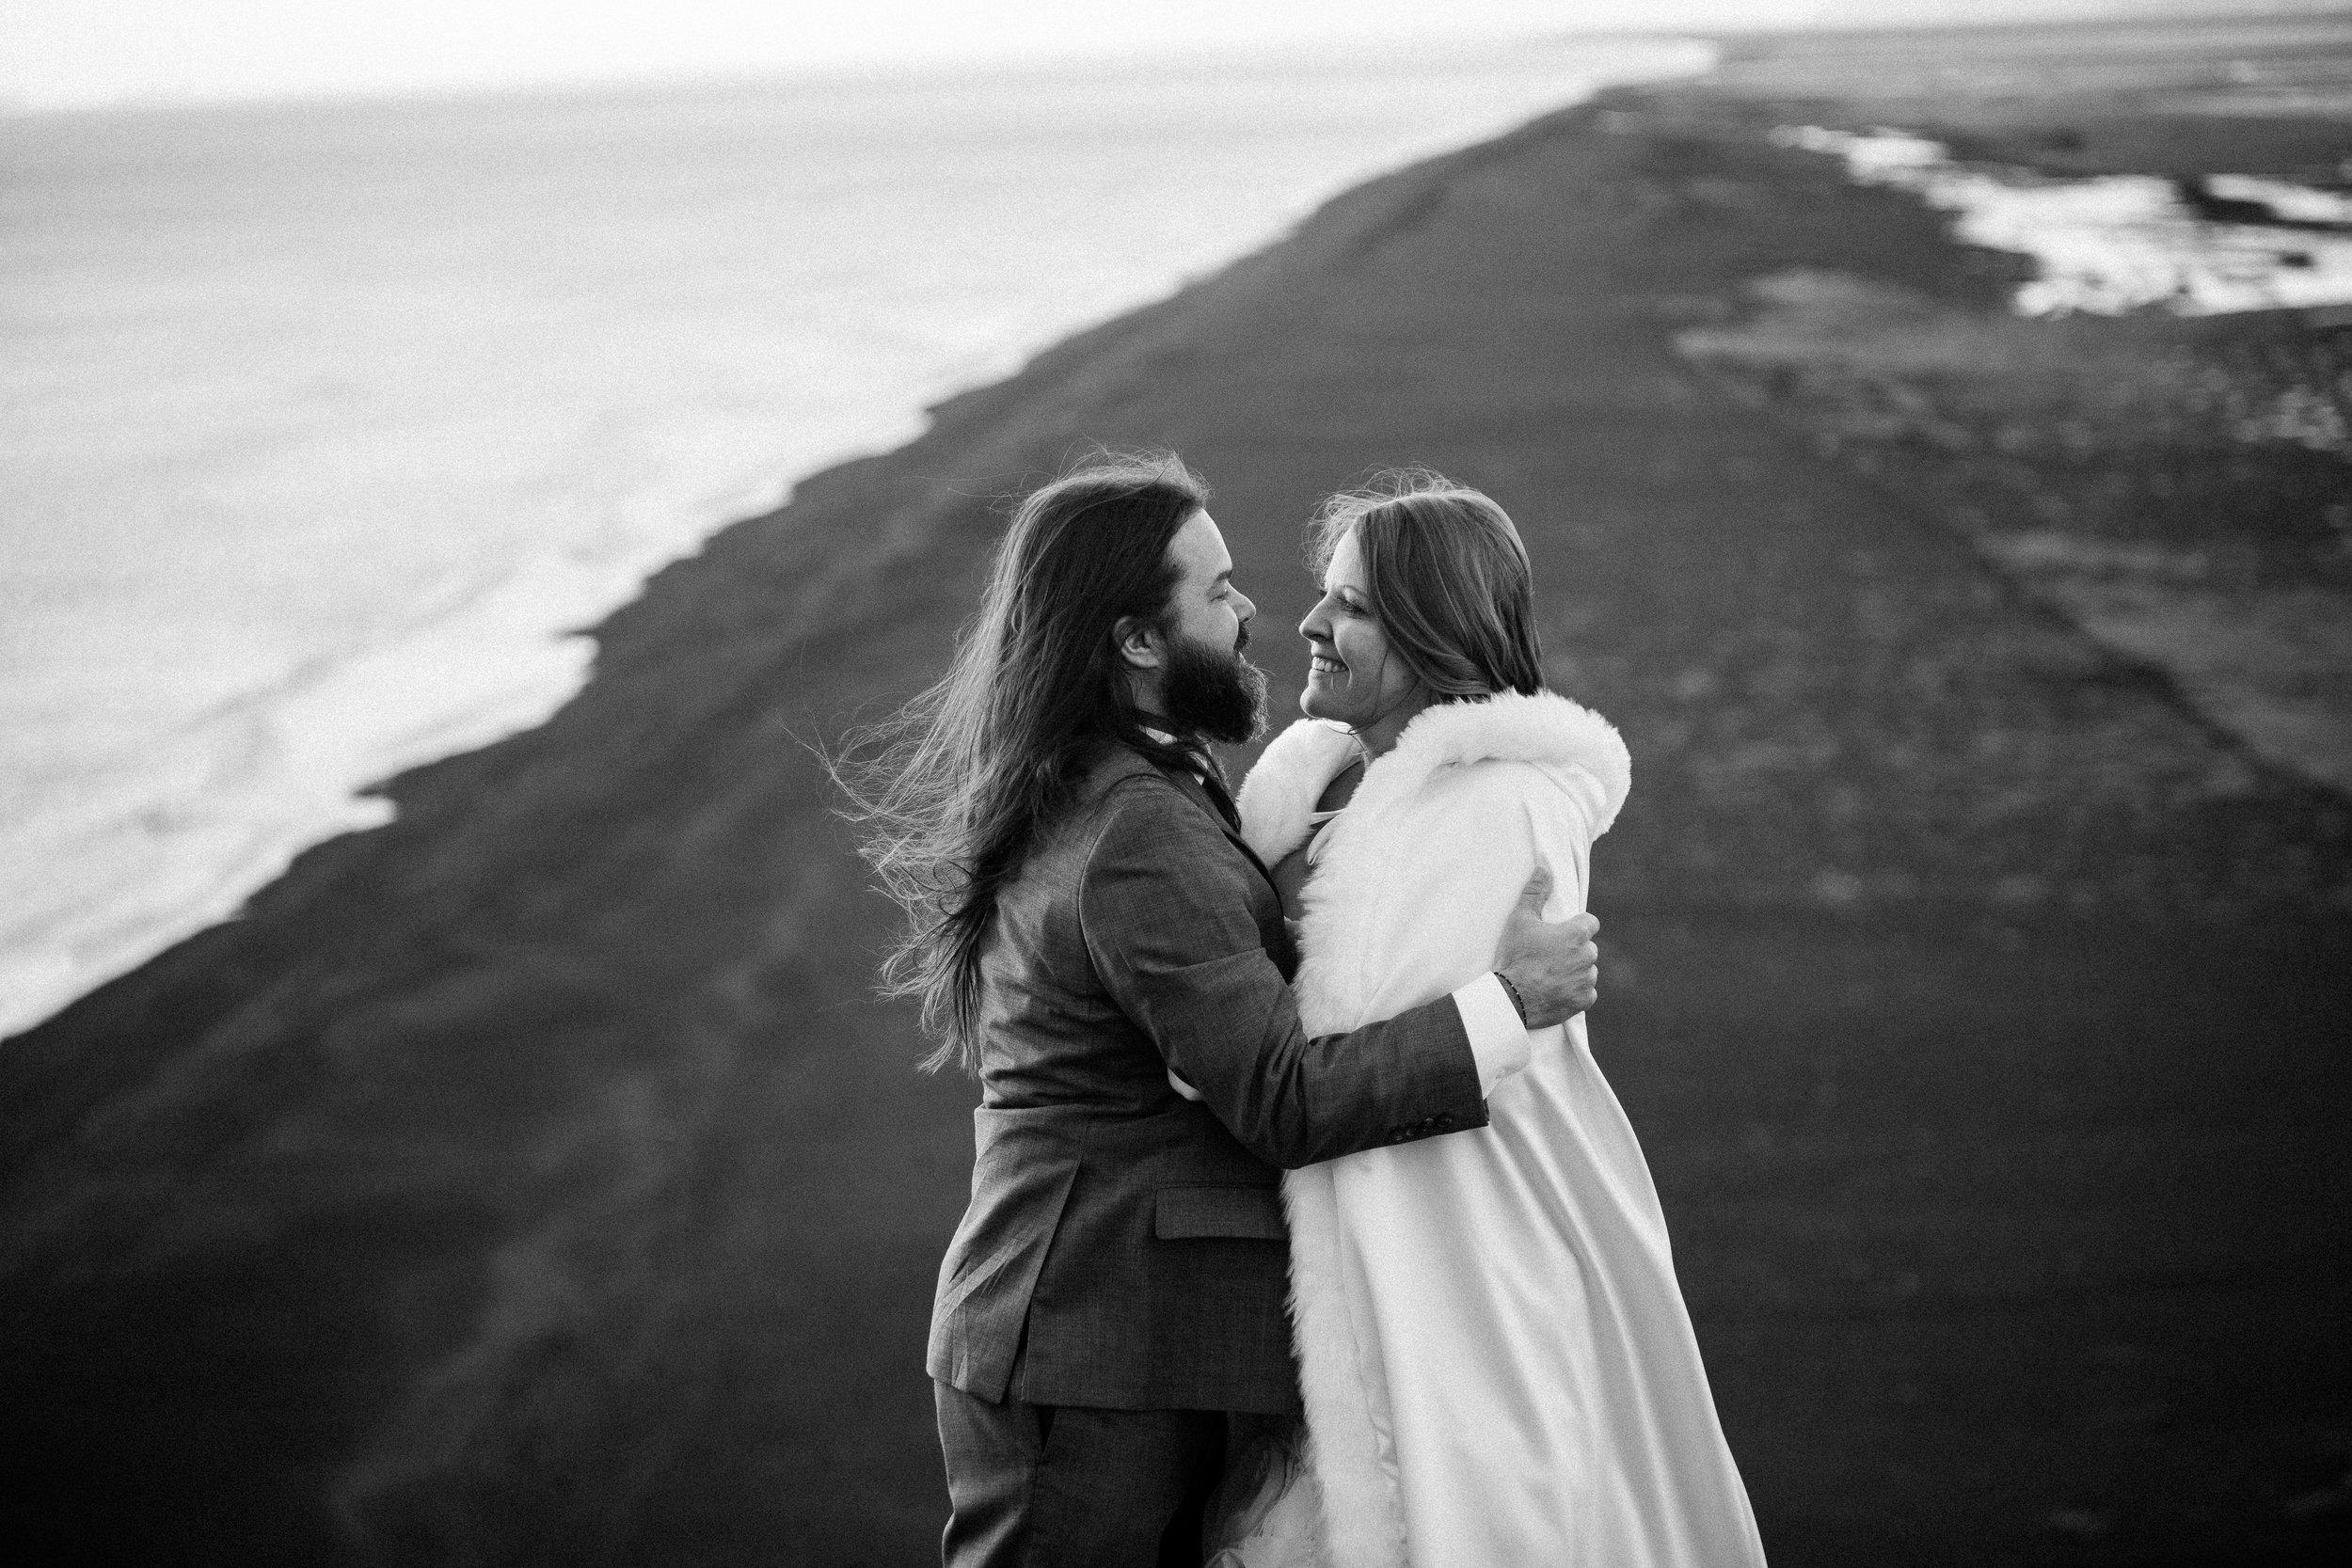 nicole-daacke-photography-iceland-winter-sunset-adventure-elopement-skogafoss-waterfall-black-sand-beach-dyrholaey-vik-iceland-intimate-wedding-black-church-elopement-photographer-39.jpg